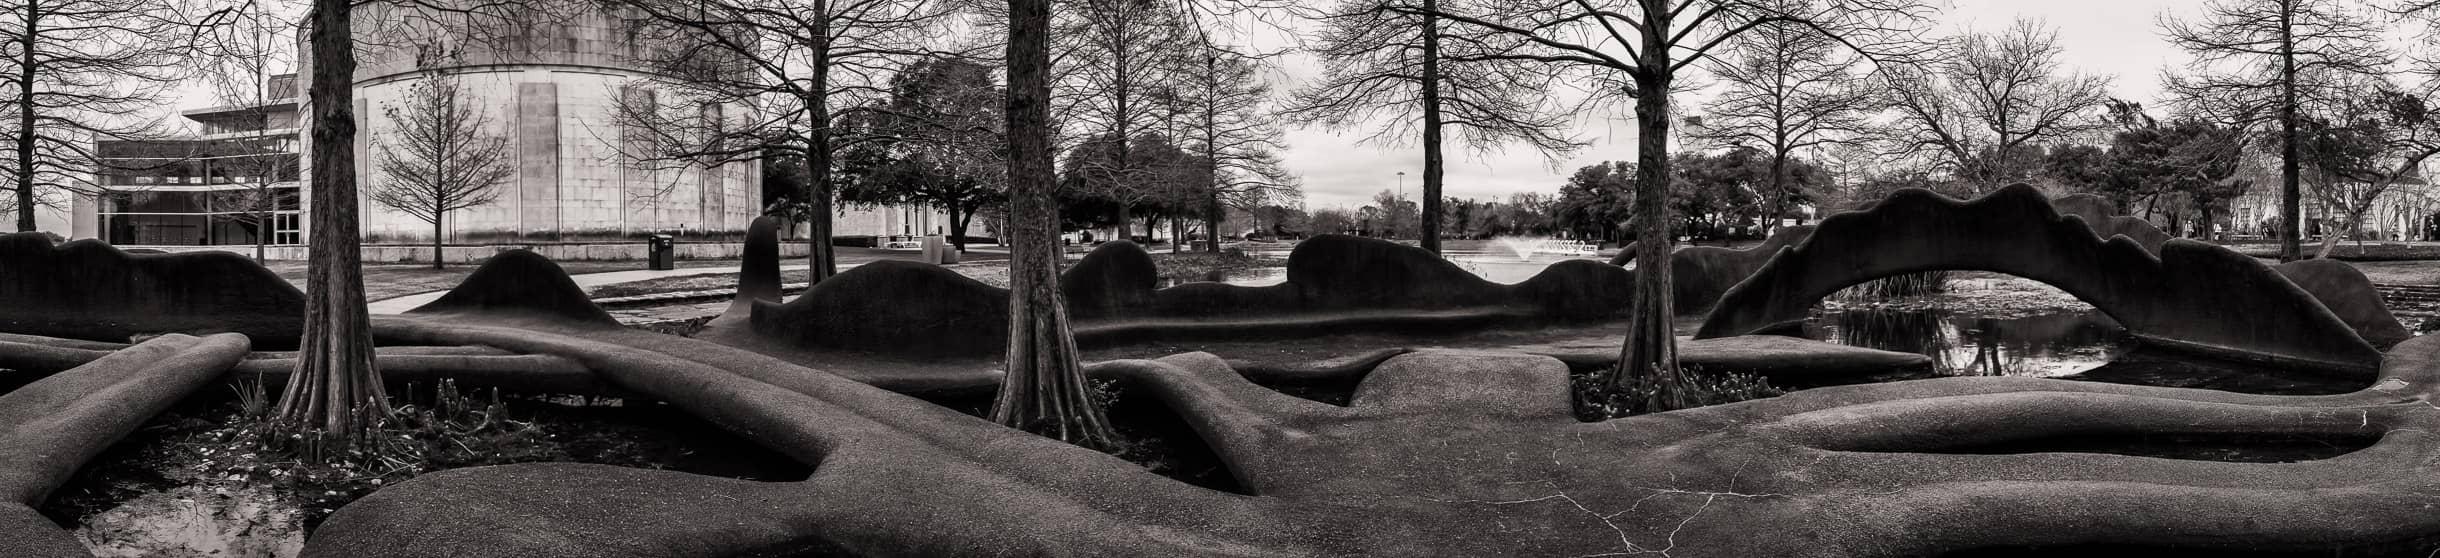 Artist Pat Johanson's serpentine sculptures snake and undulate through Leonhardt Lagoon in Dallas' Fair Park.